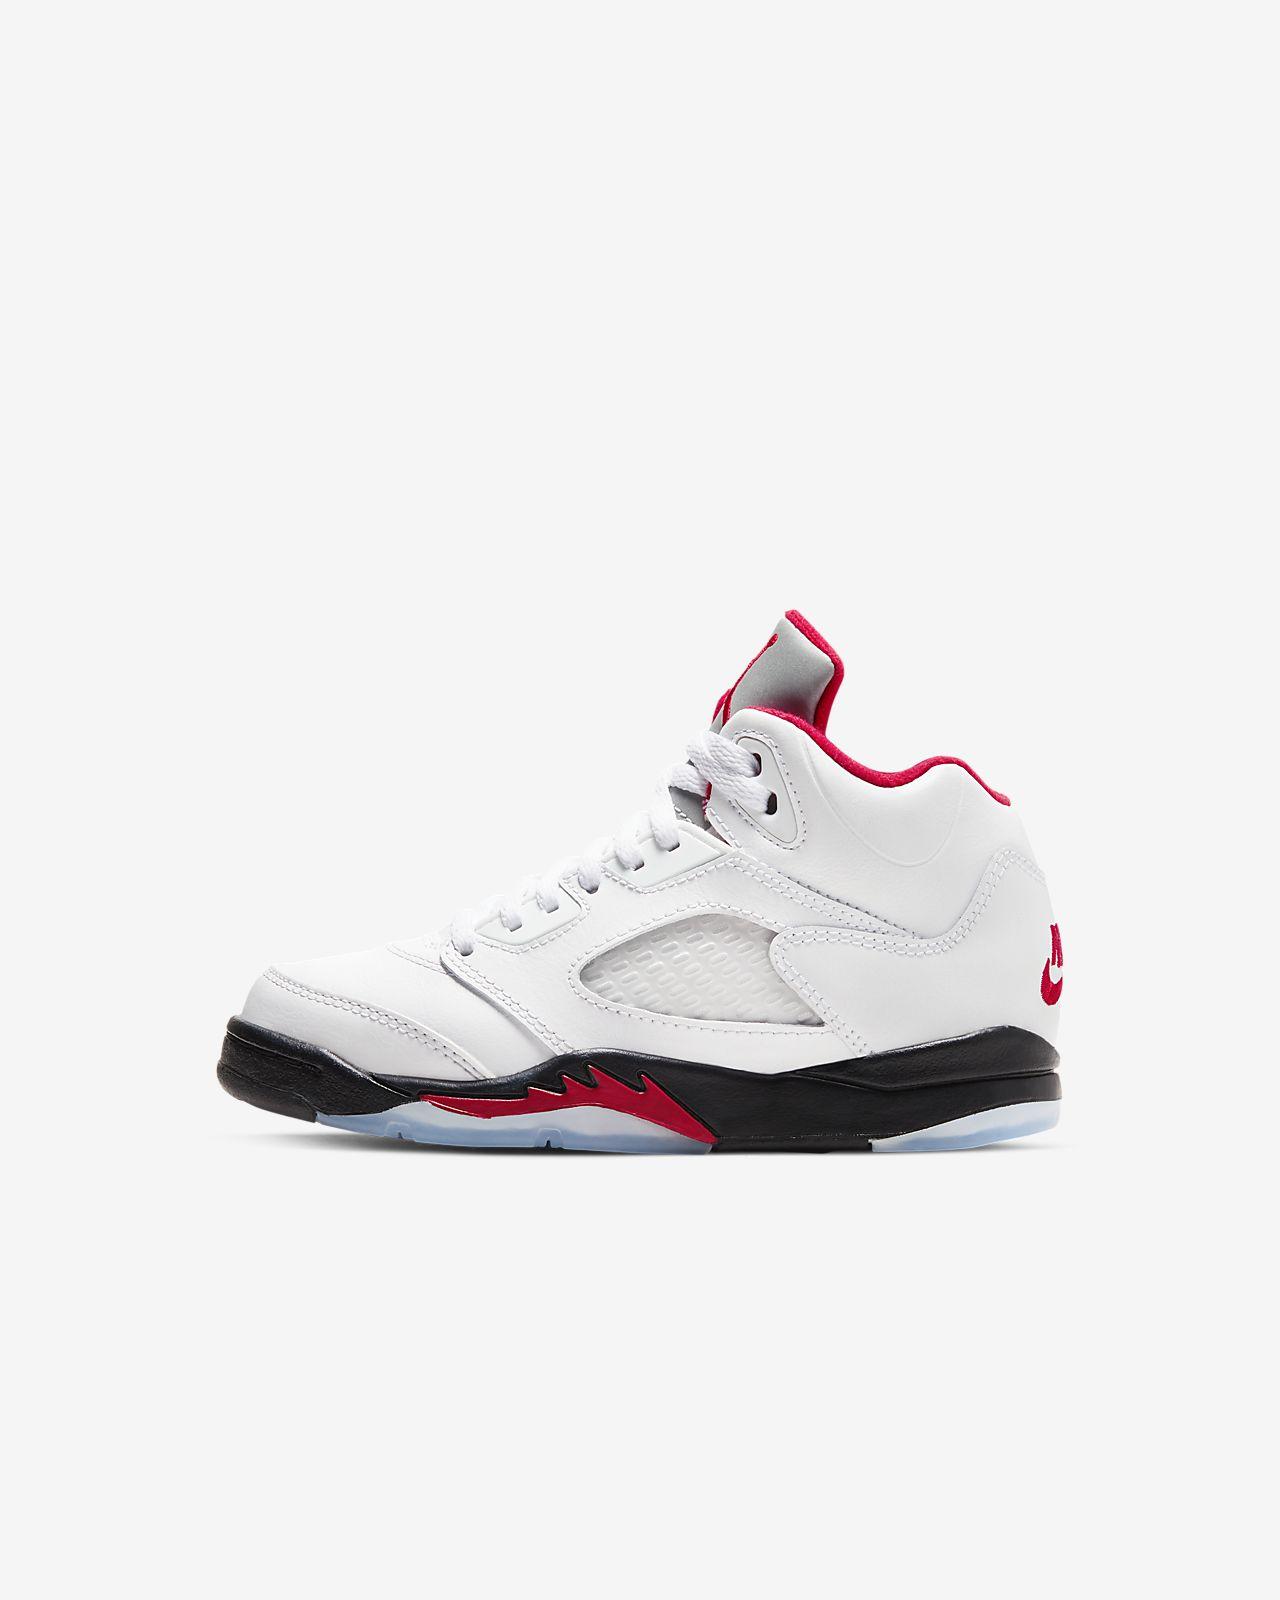 Air Jordan 5 Retro Younger Kids' Shoe